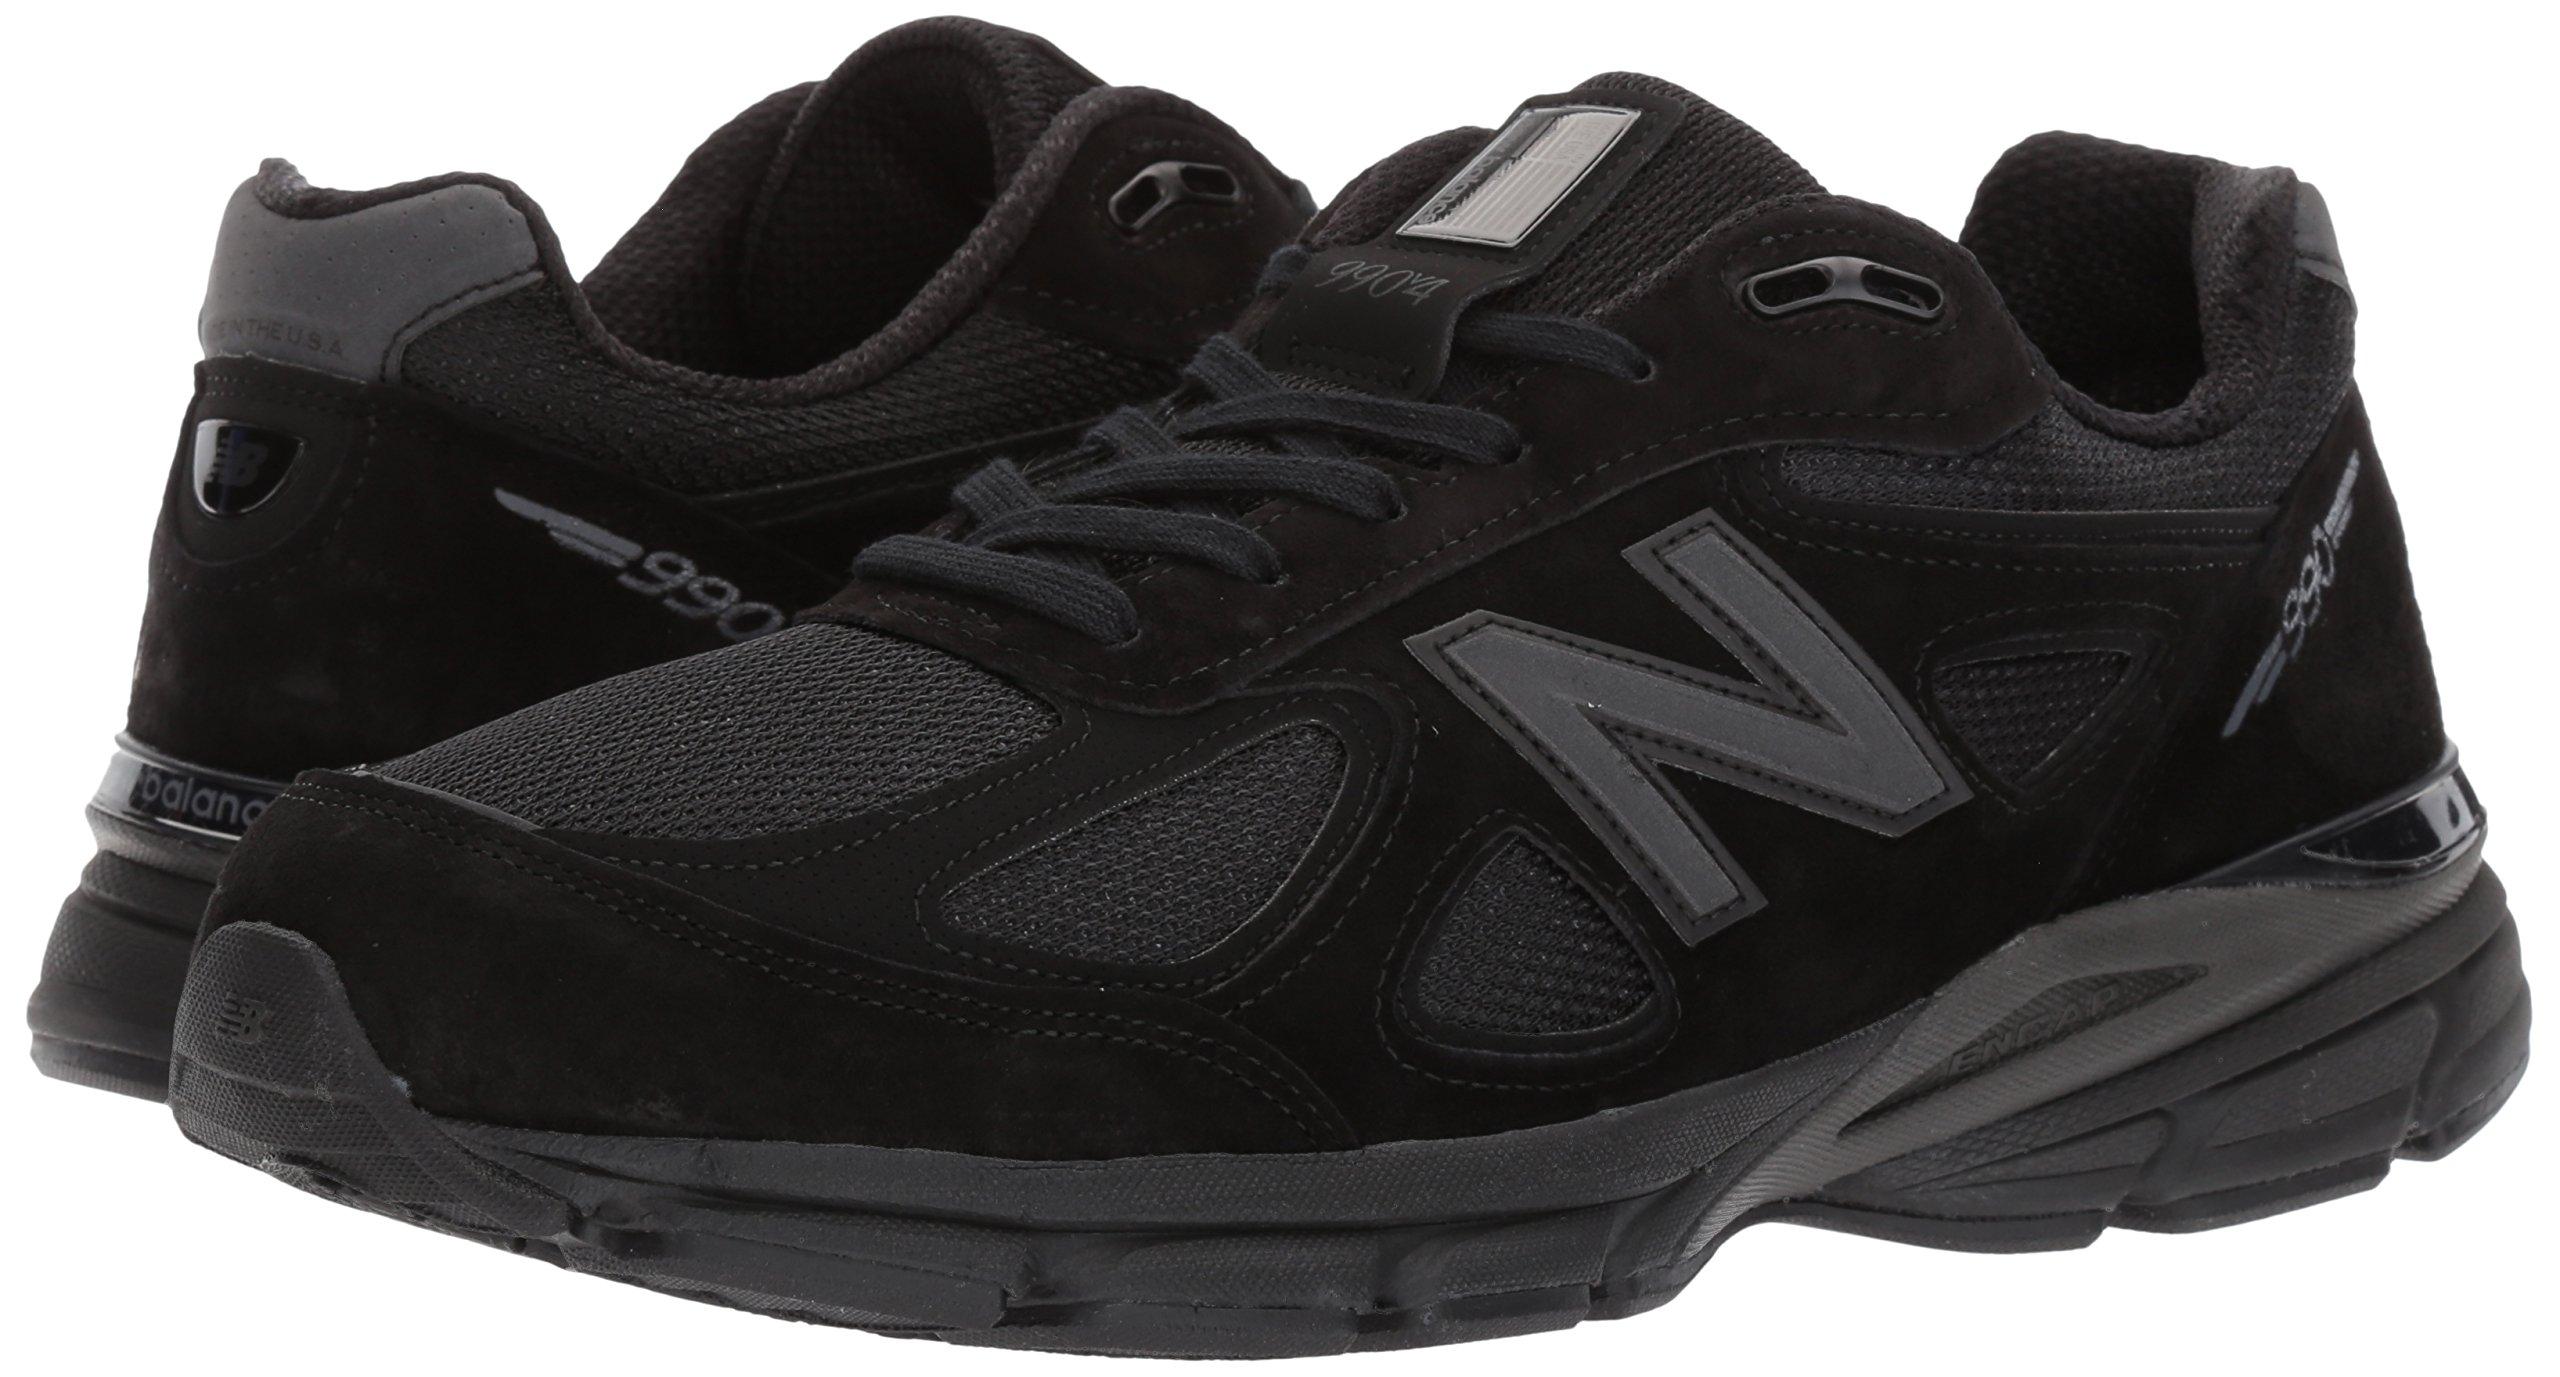 New Balance Men's 990V4 Running Shoe, Black/Black, 11 2E US by New Balance (Image #6)